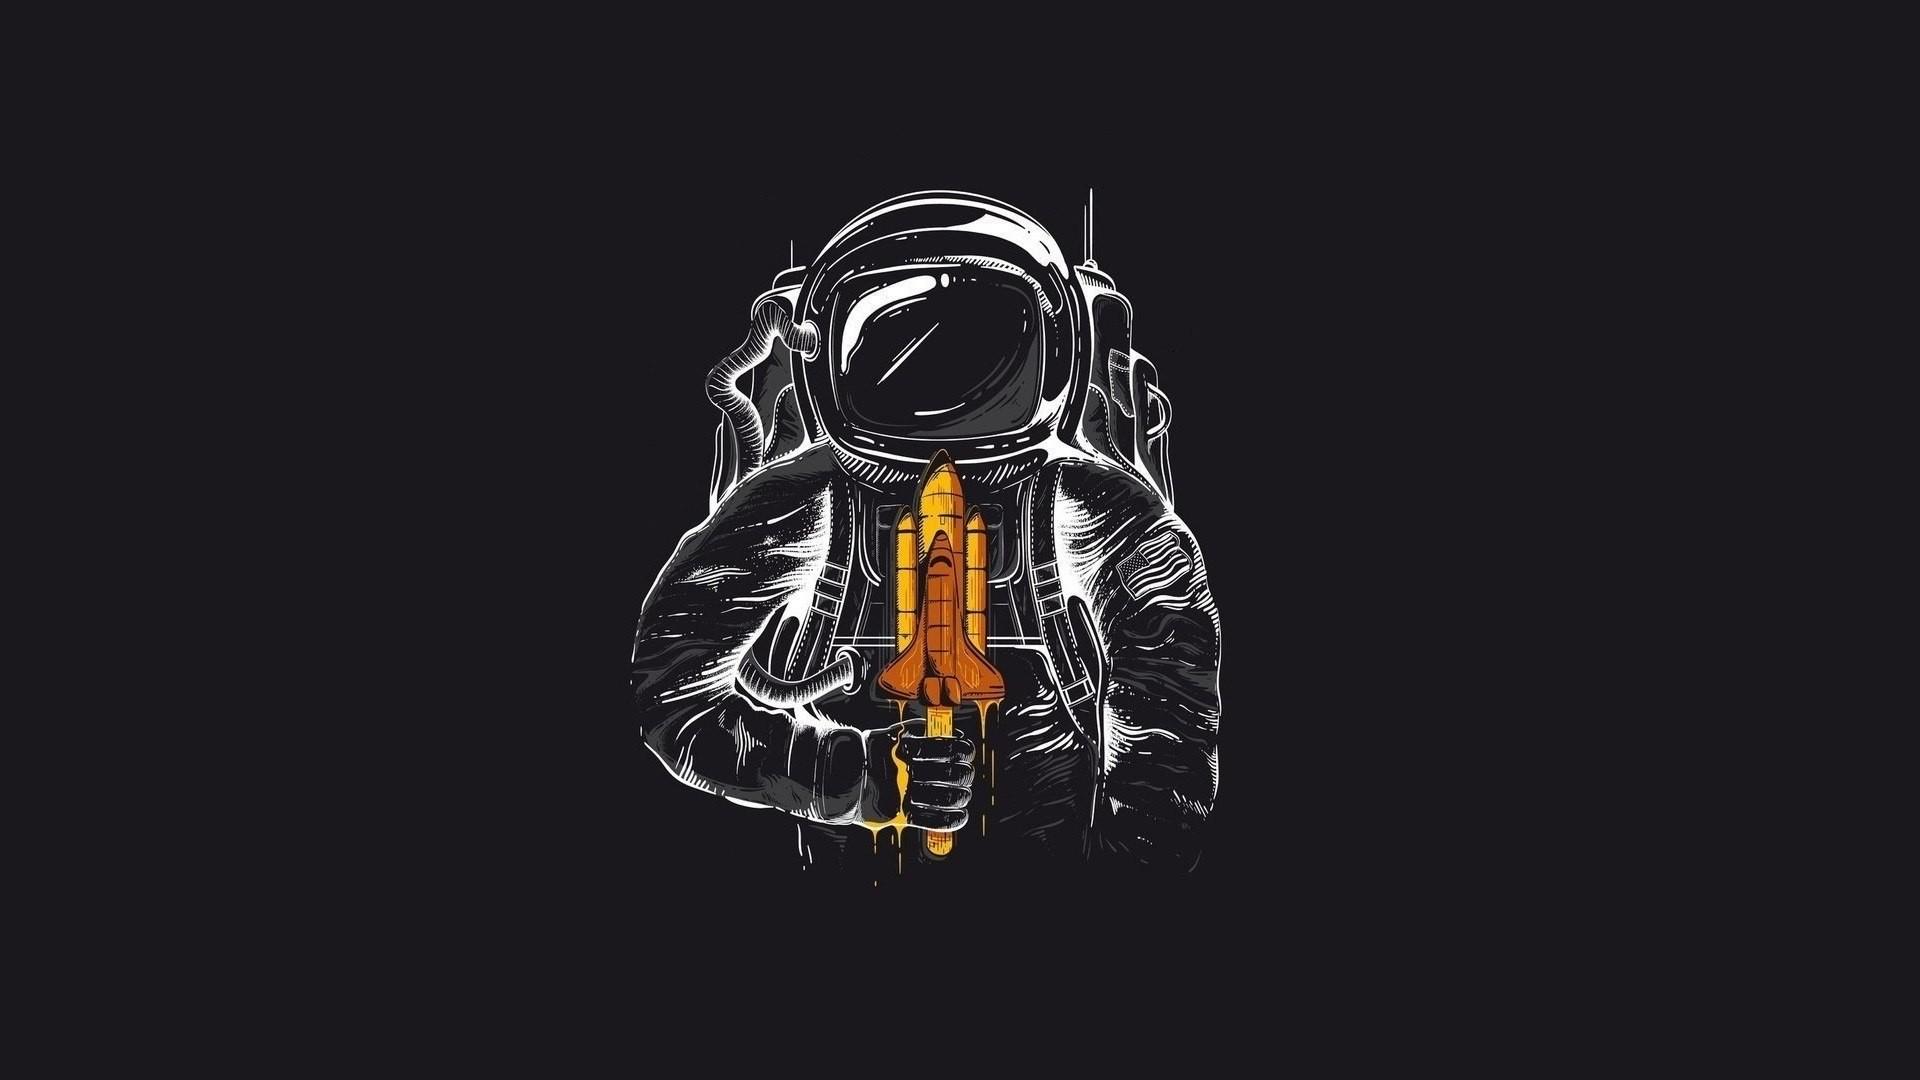 Astronaut Images 01940